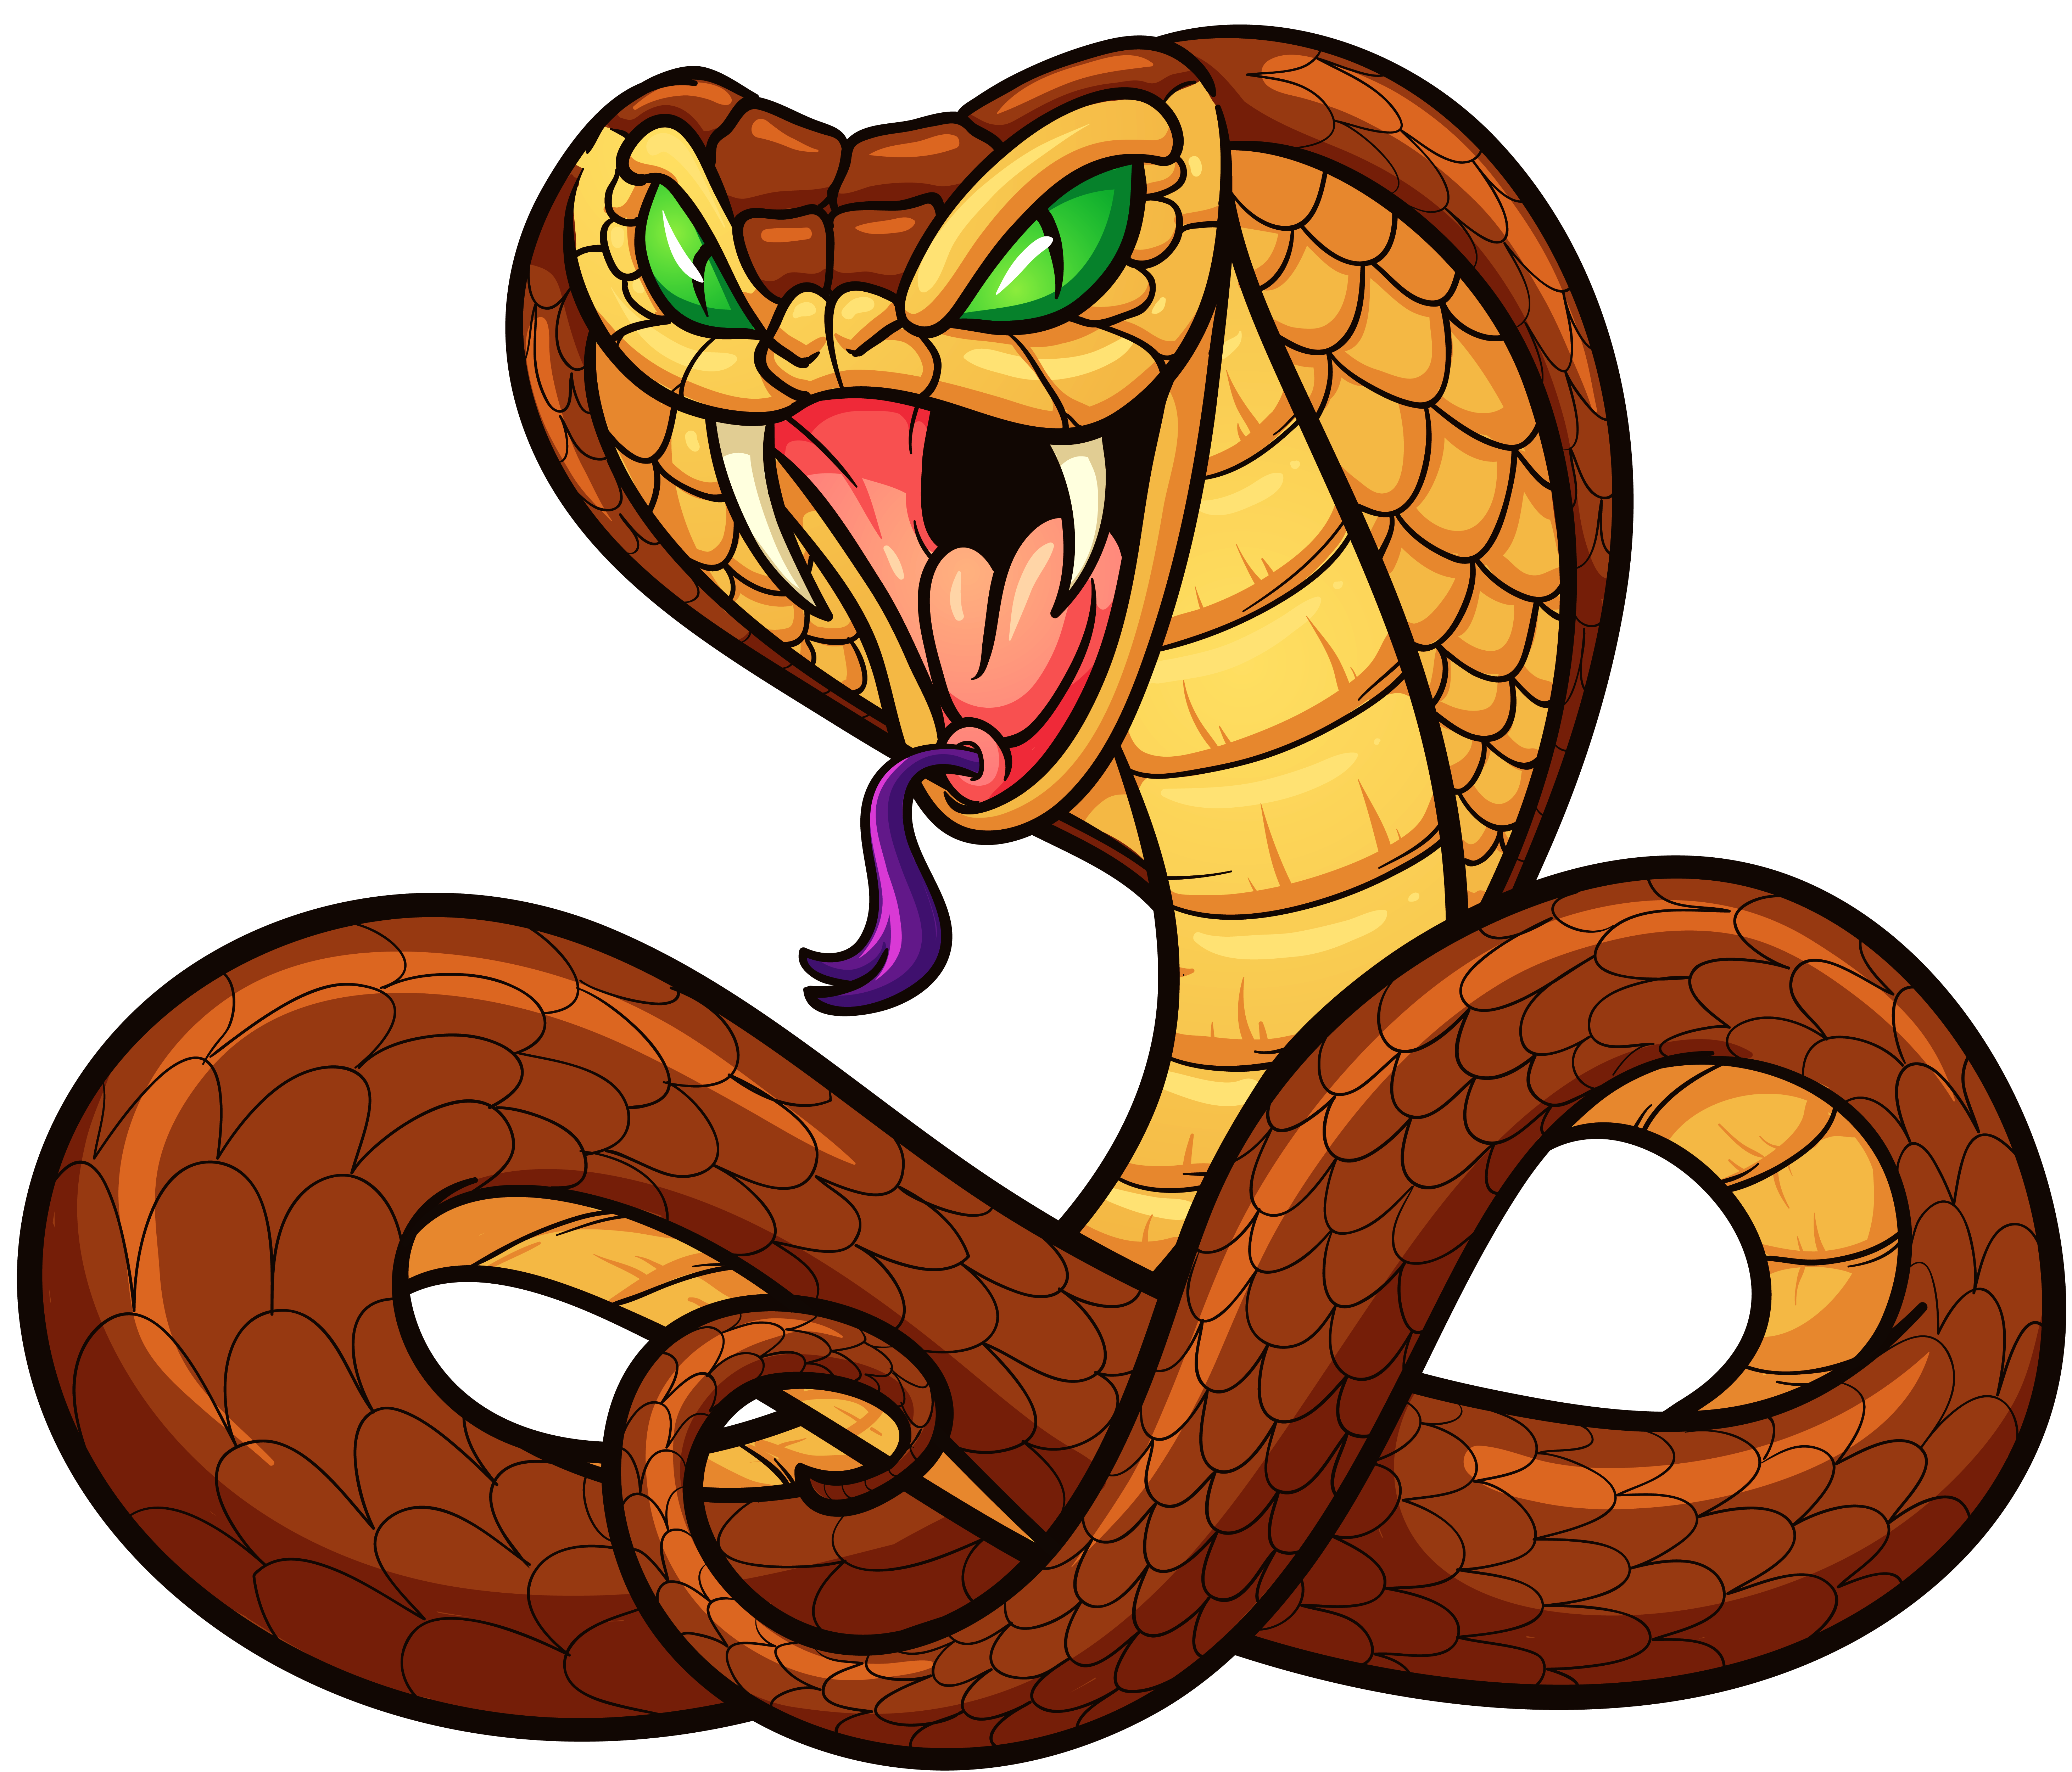 картинки мульт змей вот ниже вас